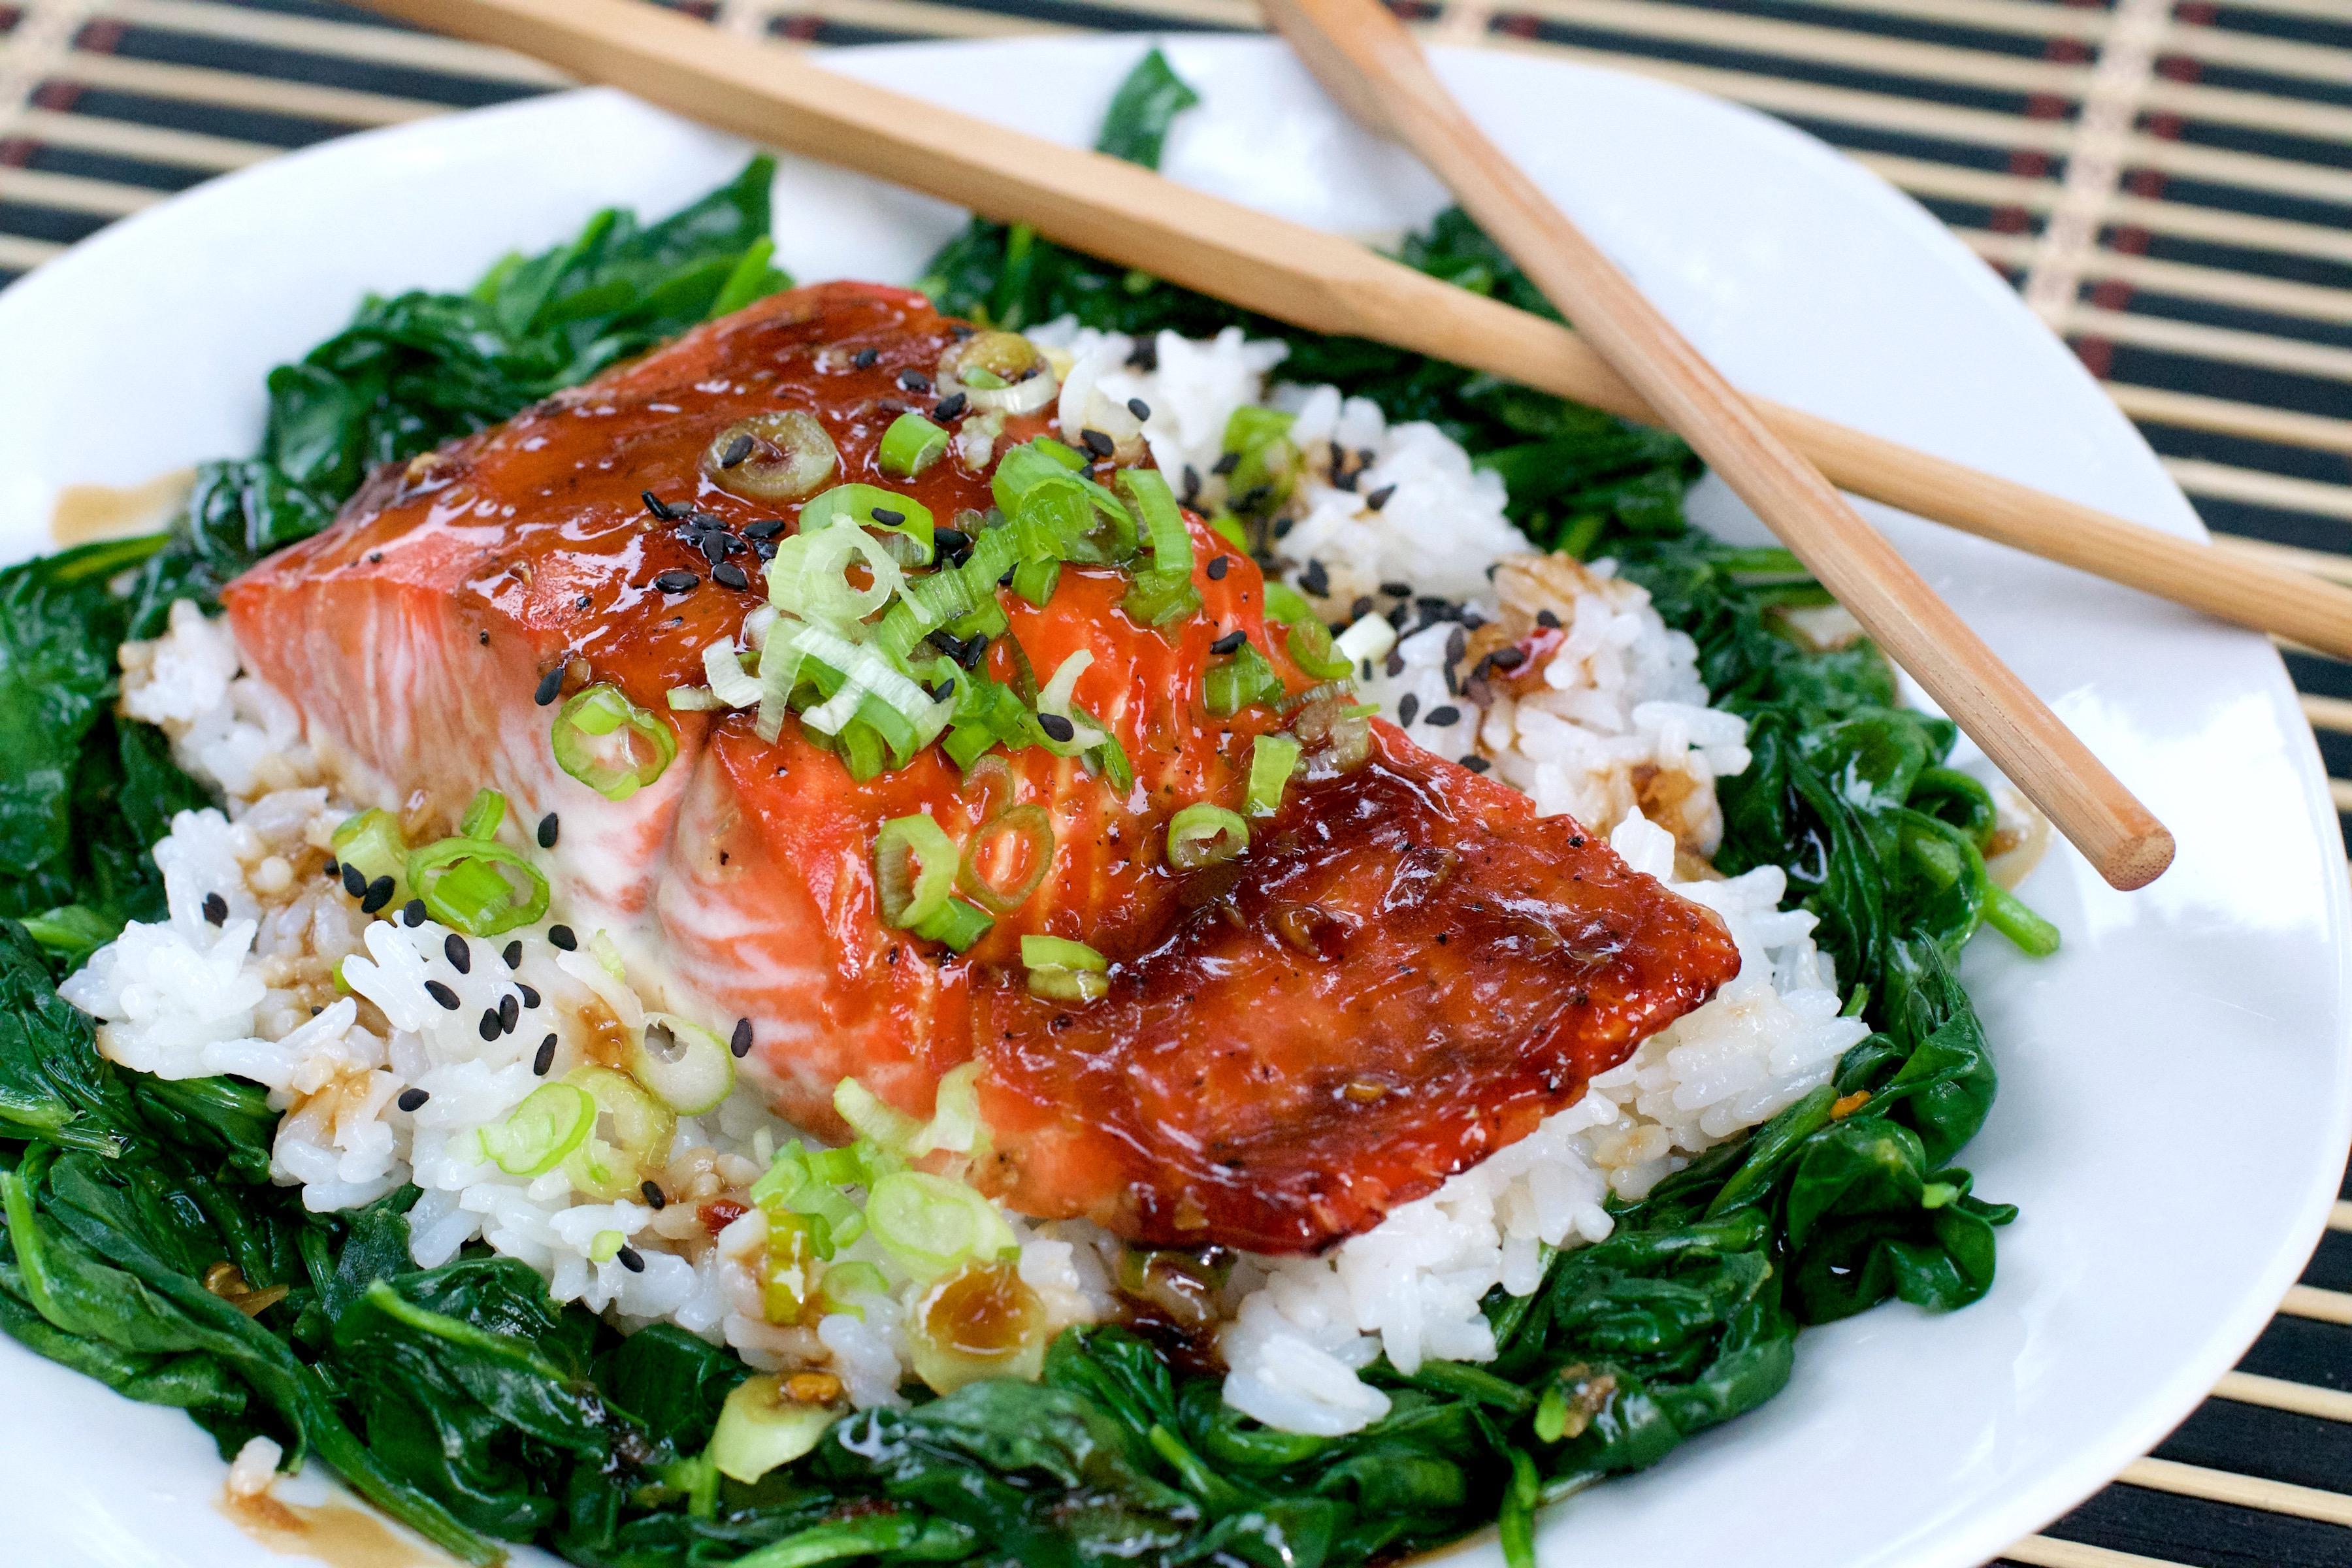 Glazed Salmon Rice Bowl - What the Forks for Dinner?